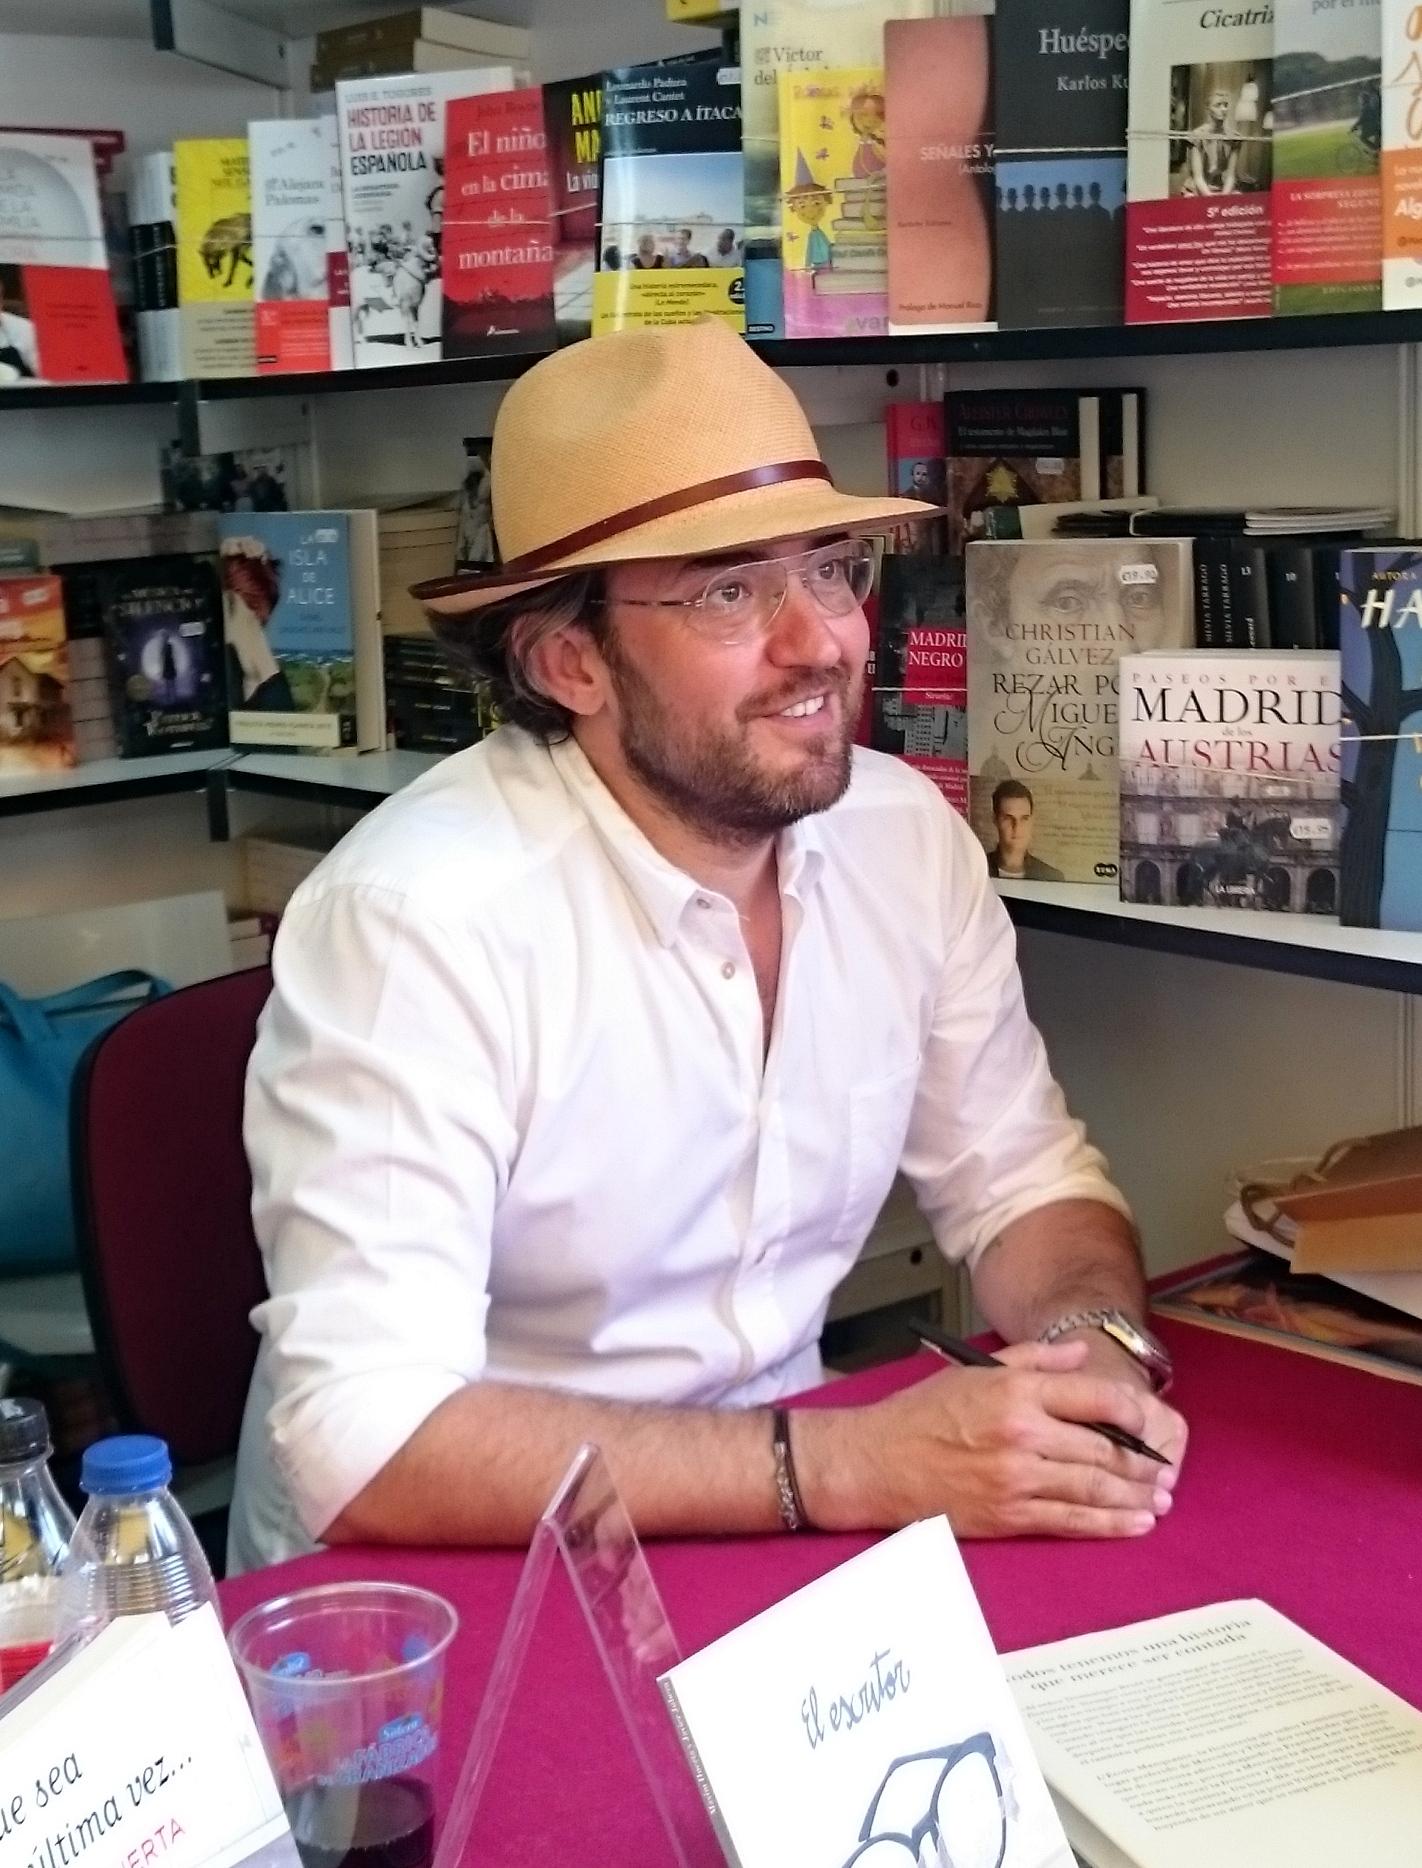 Archivo m xim huerta en la feria del libro 5 de junio de for Maxim huerta libros